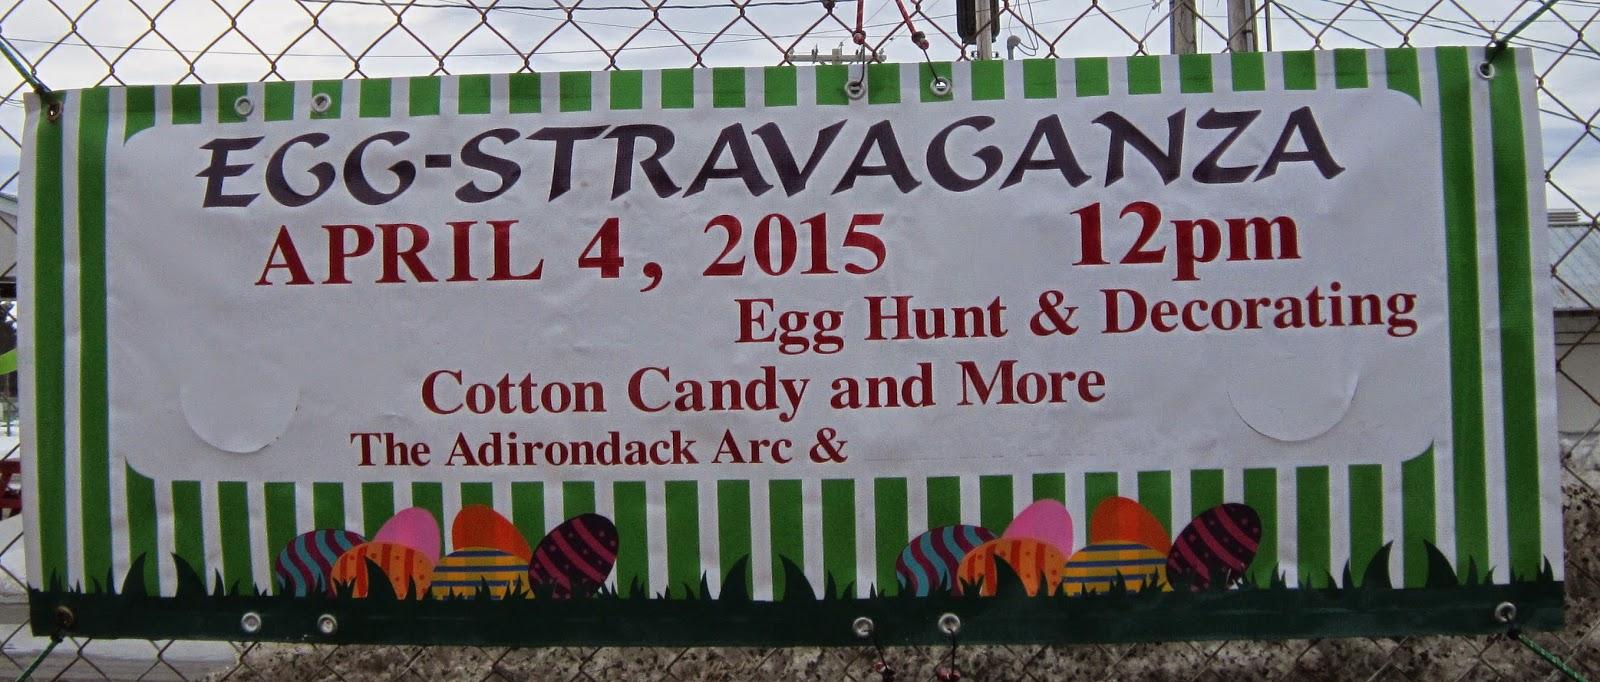 Adirondack egg hunt, Malone Fairgrounds, Eggstravaganza,